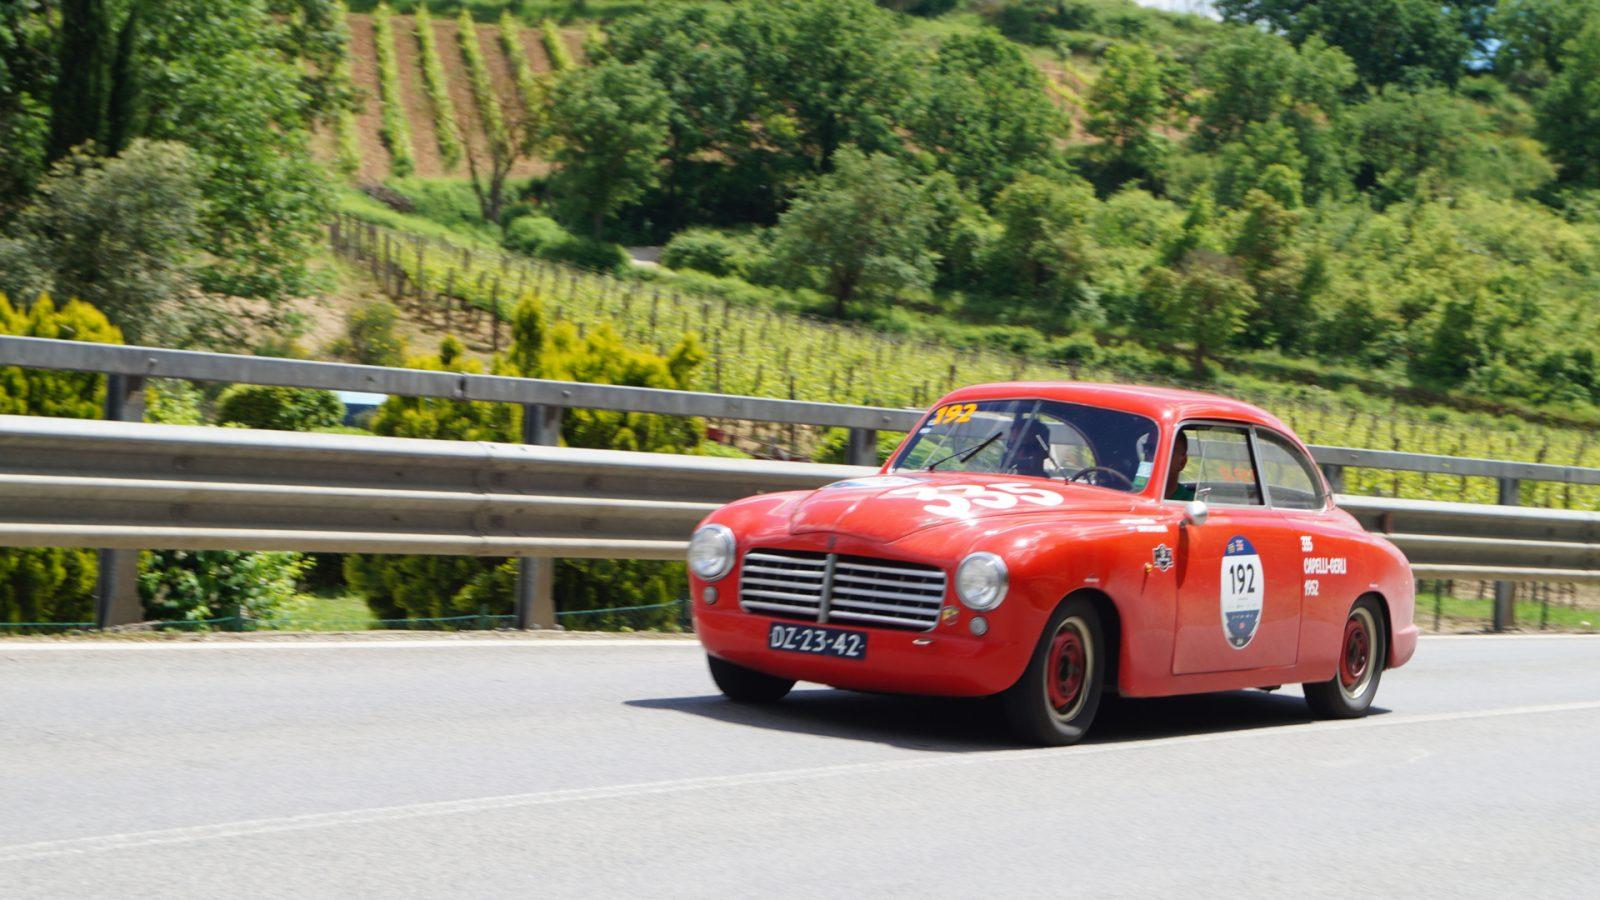 Abarth 1400 Touring Superleggera (1950), Mille Miglia eligible car